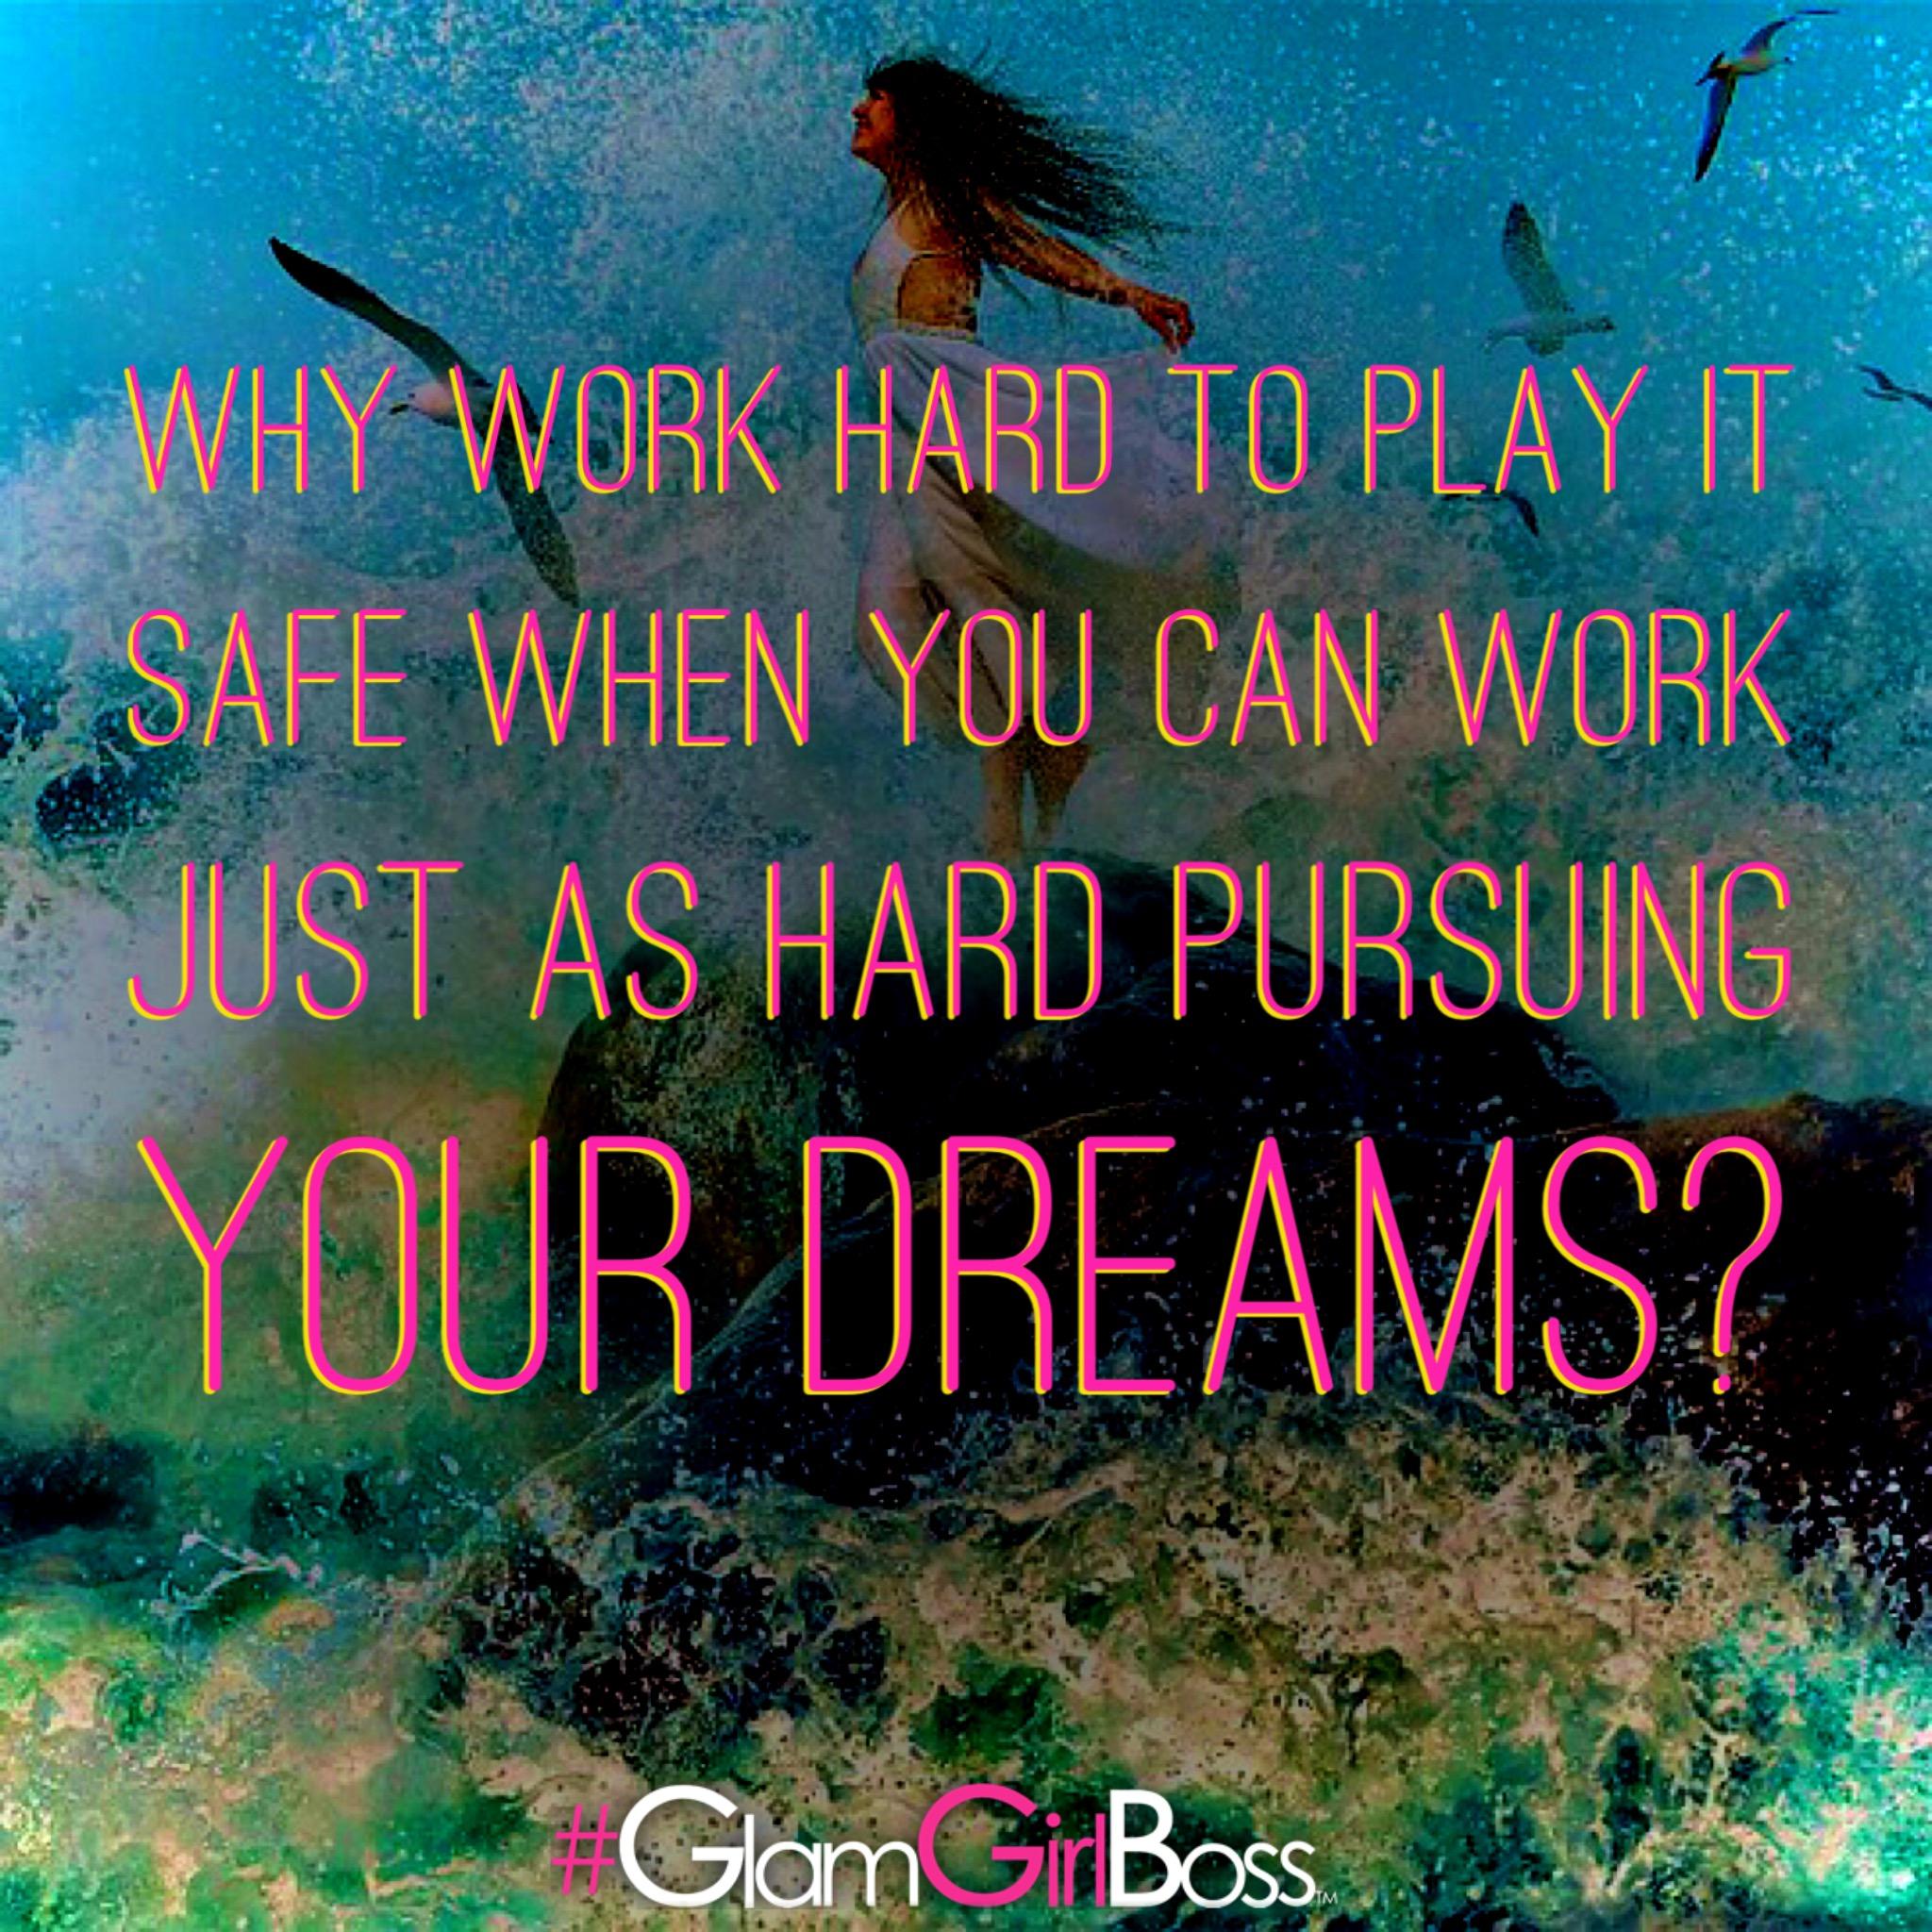 Work hard to pursue your dreams.